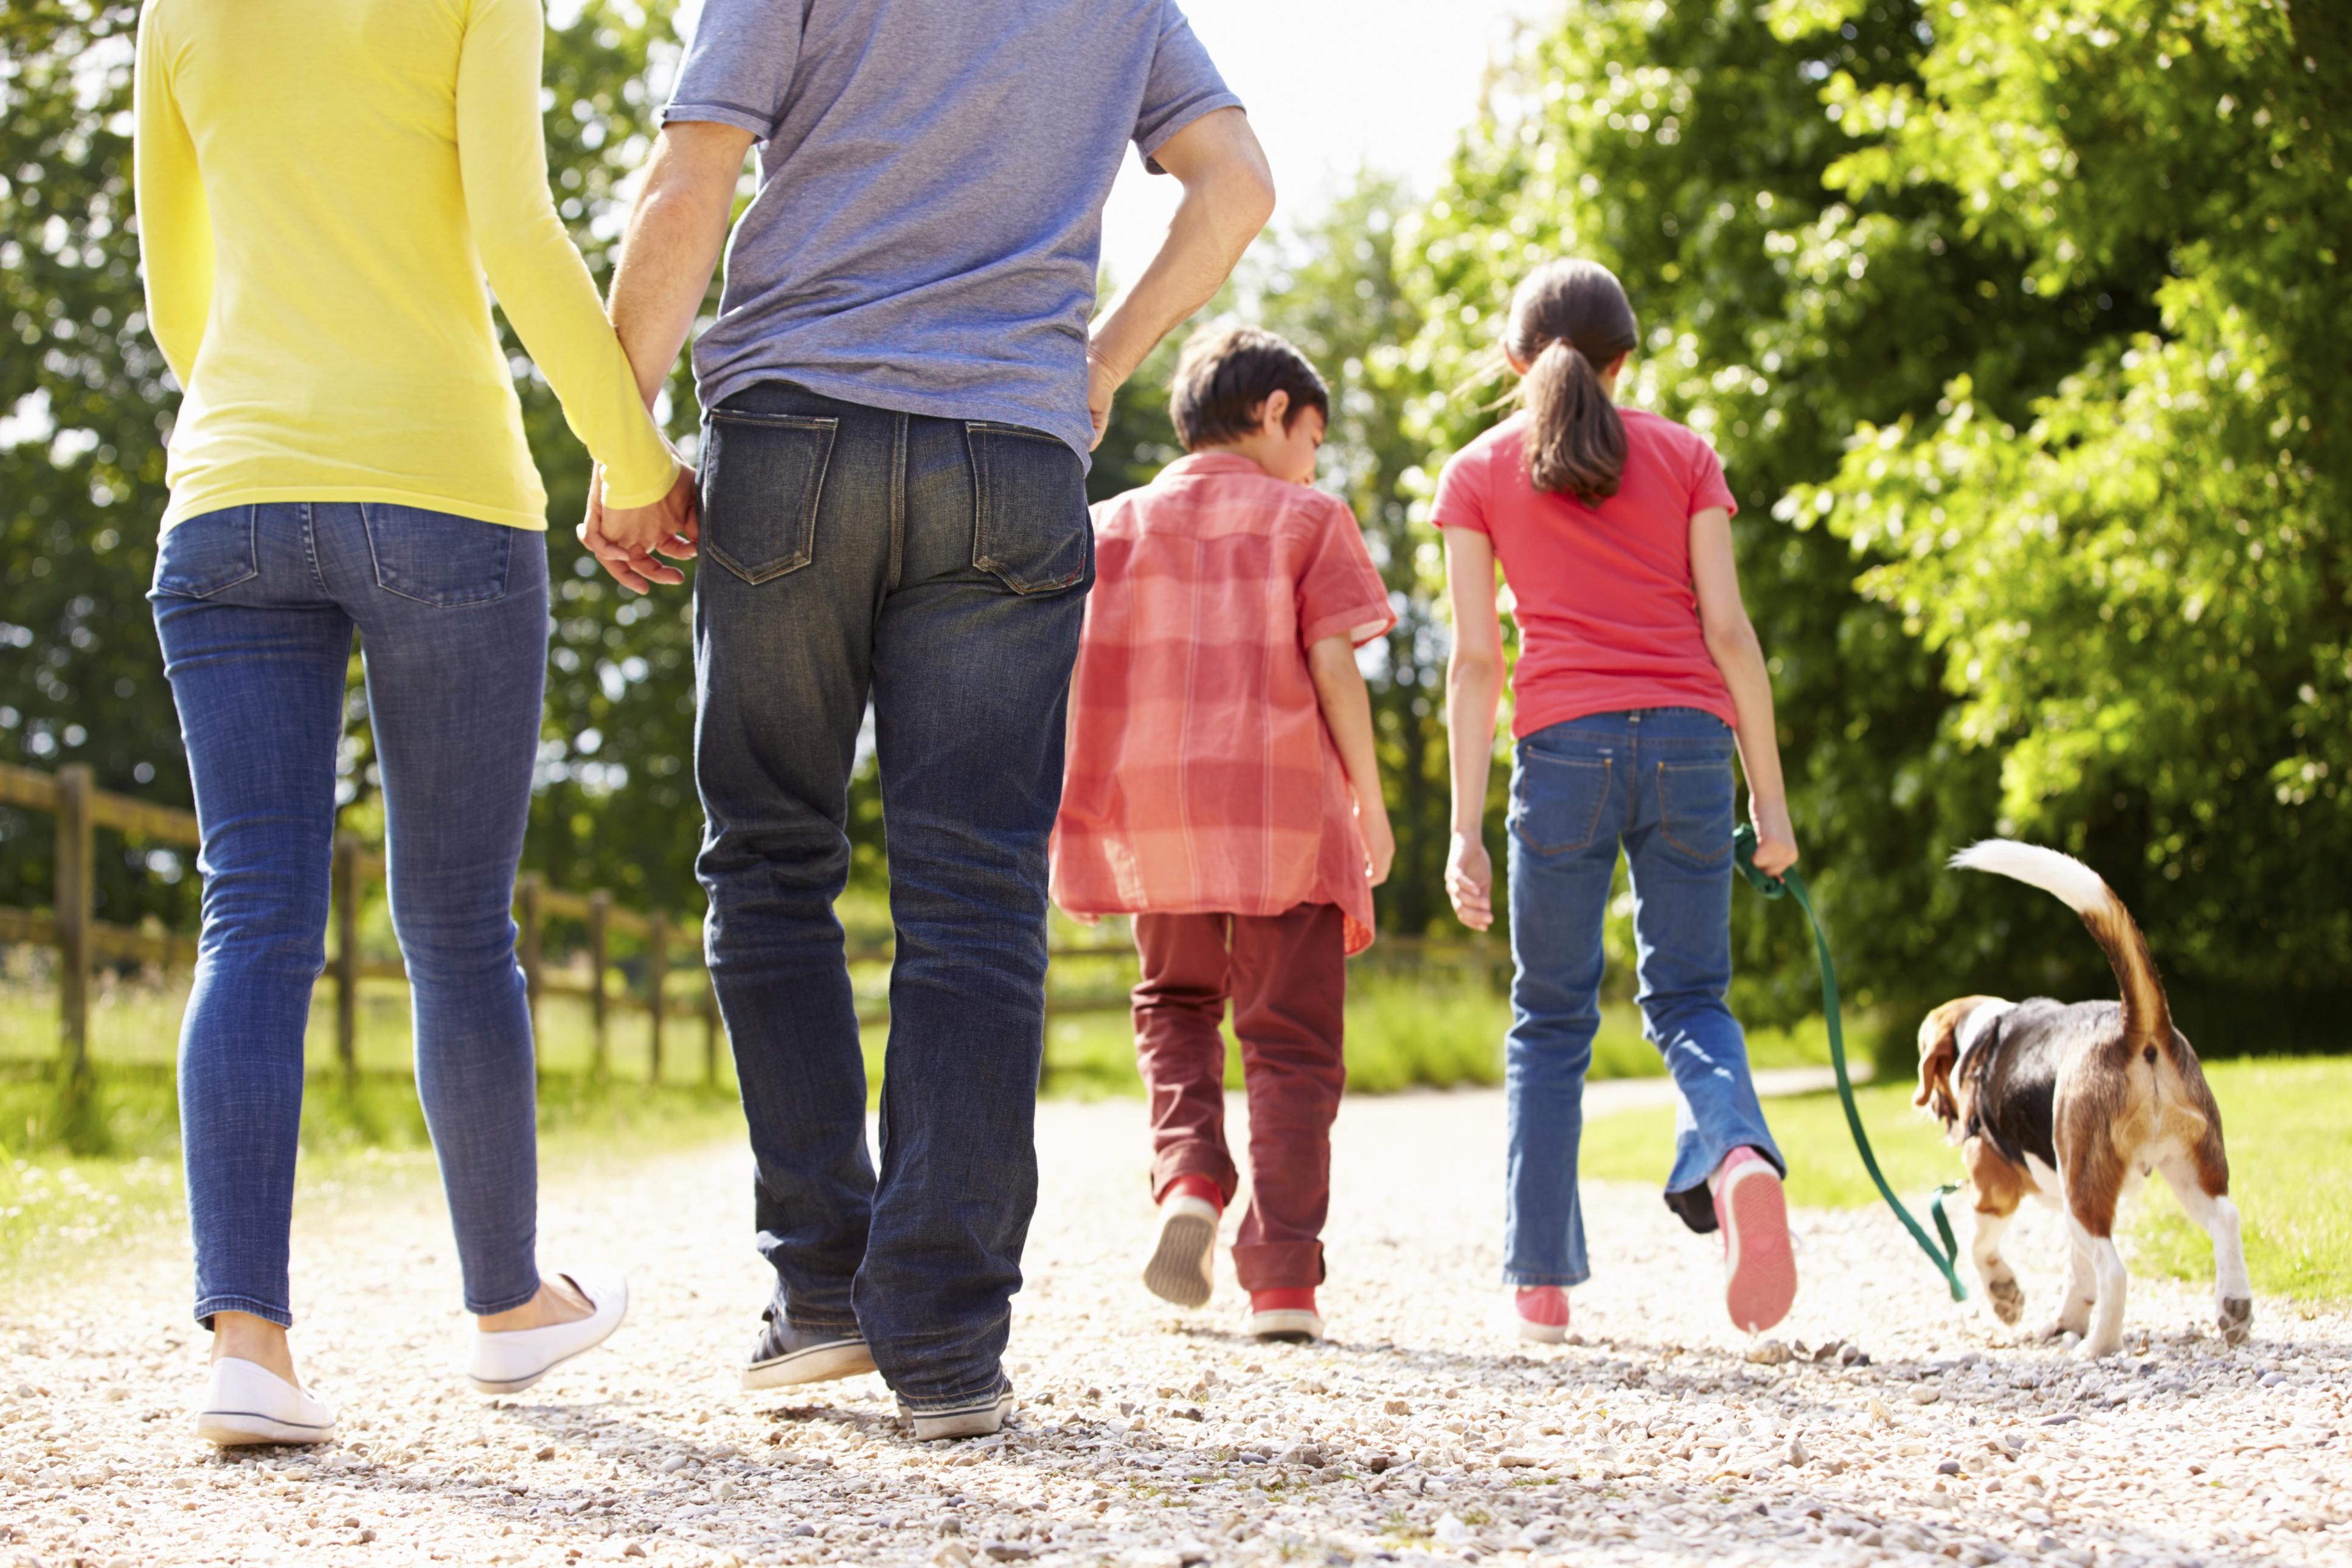 Family_walk_ThinkstockPhotos-466988813